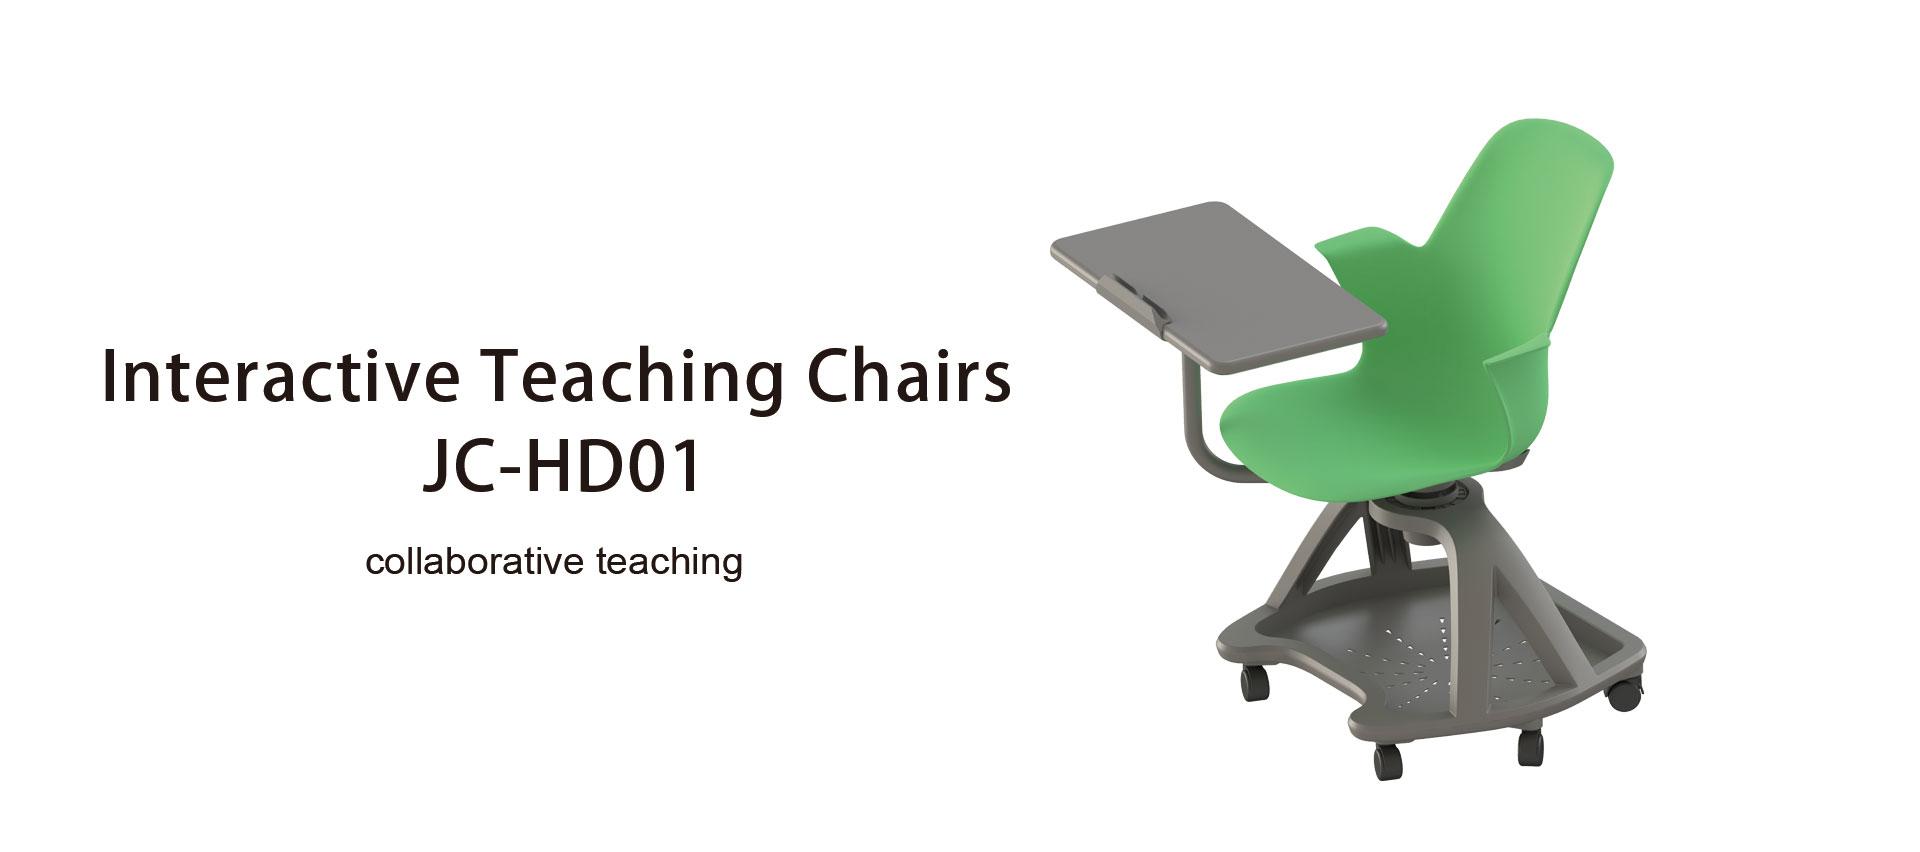 Interactive Teaching Chairs JC-HD01